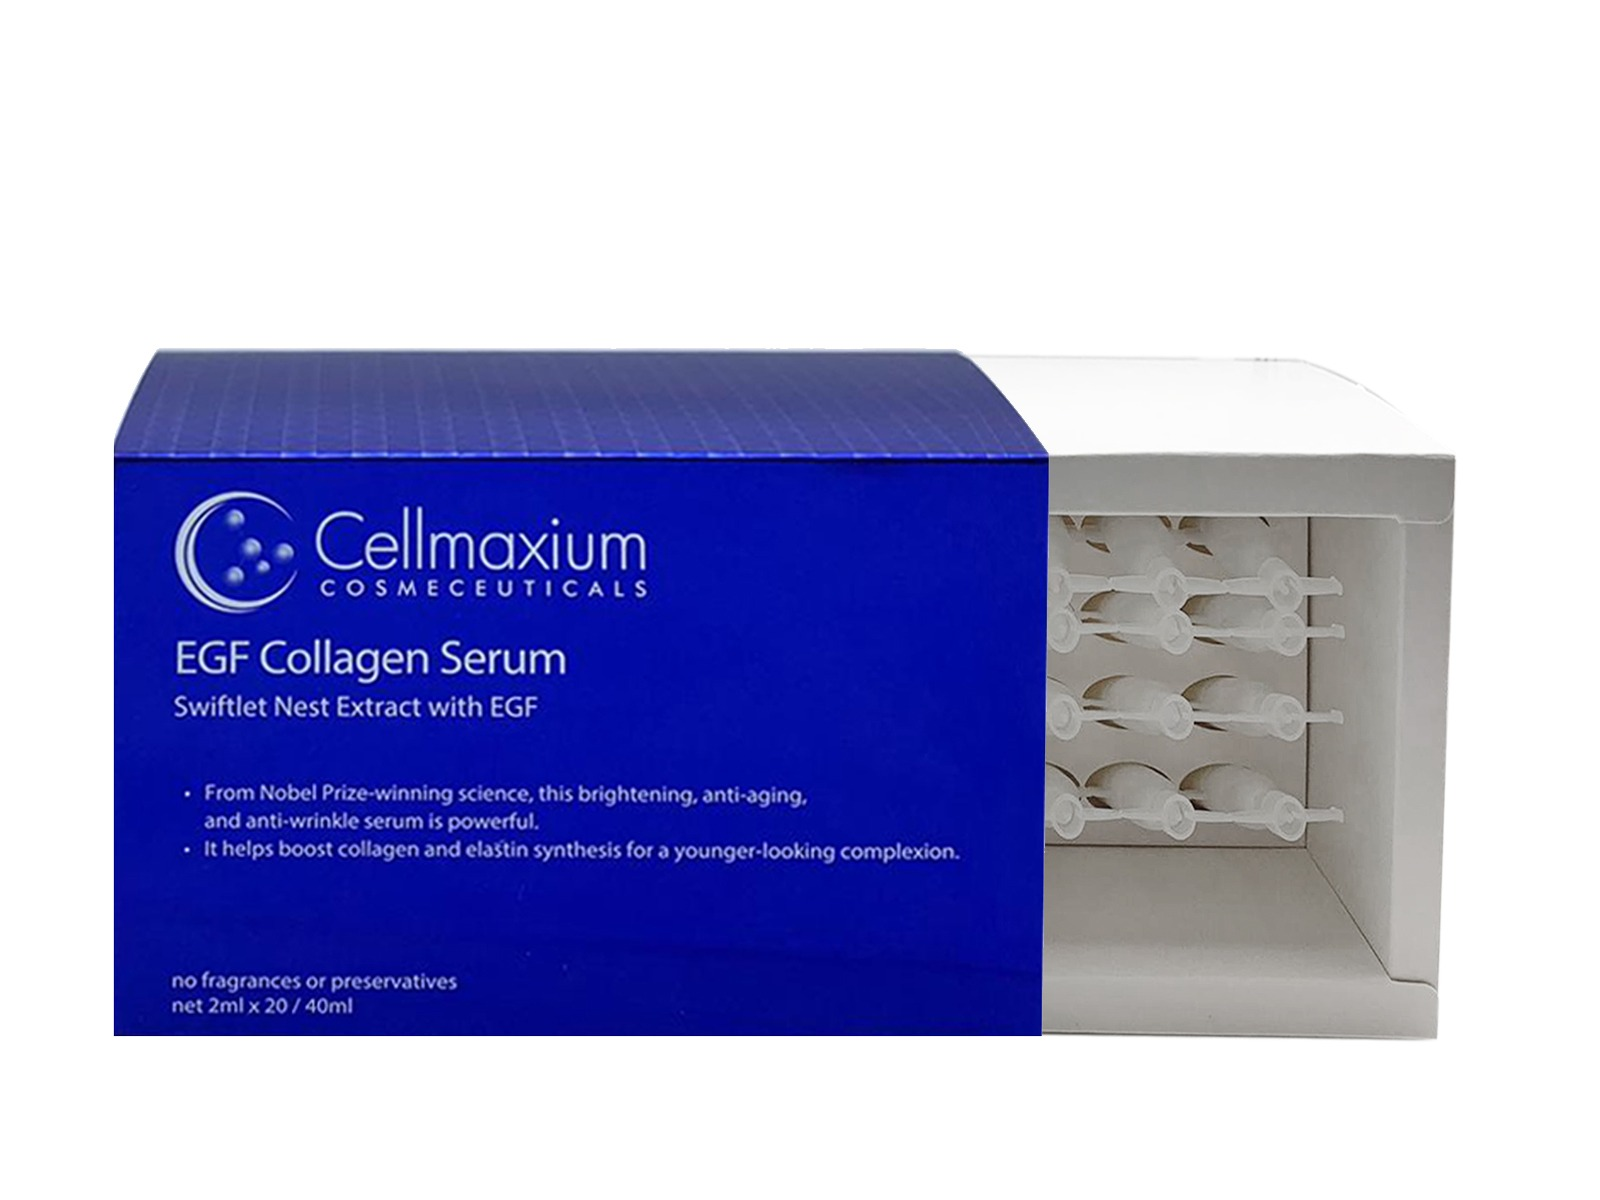 Cellmaxium EGF Collagen Serum  2ml x 20